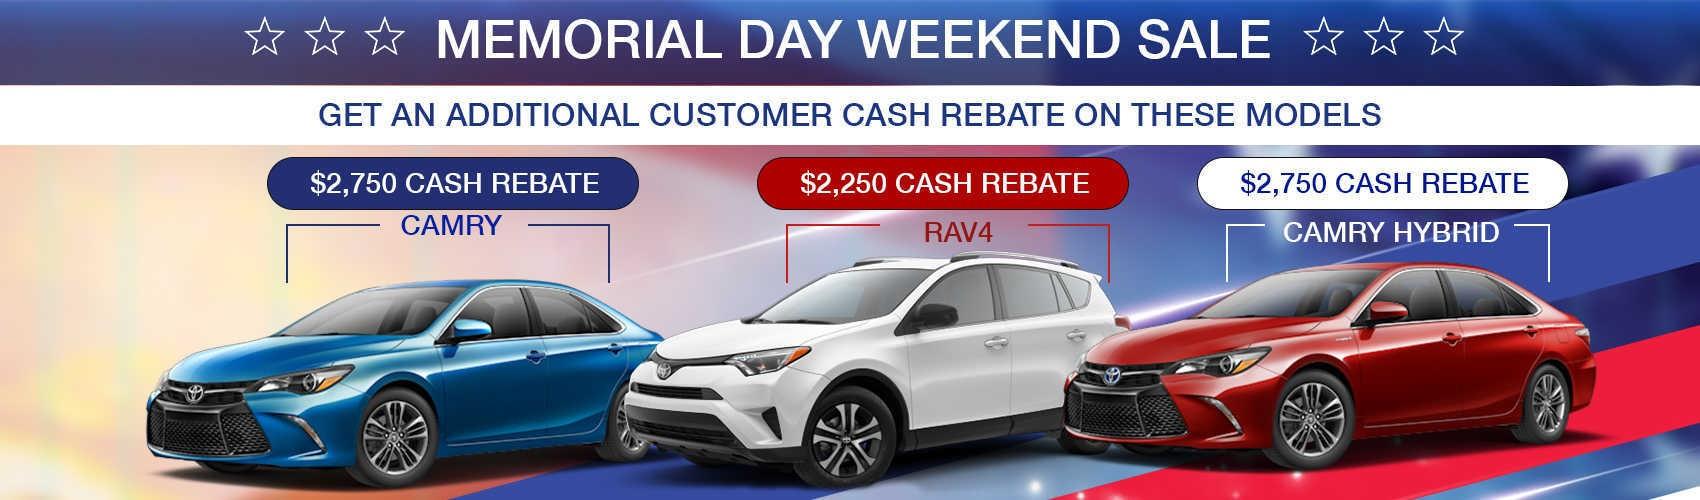 Memorial Day Weekend SALE At Beaverton Toyota